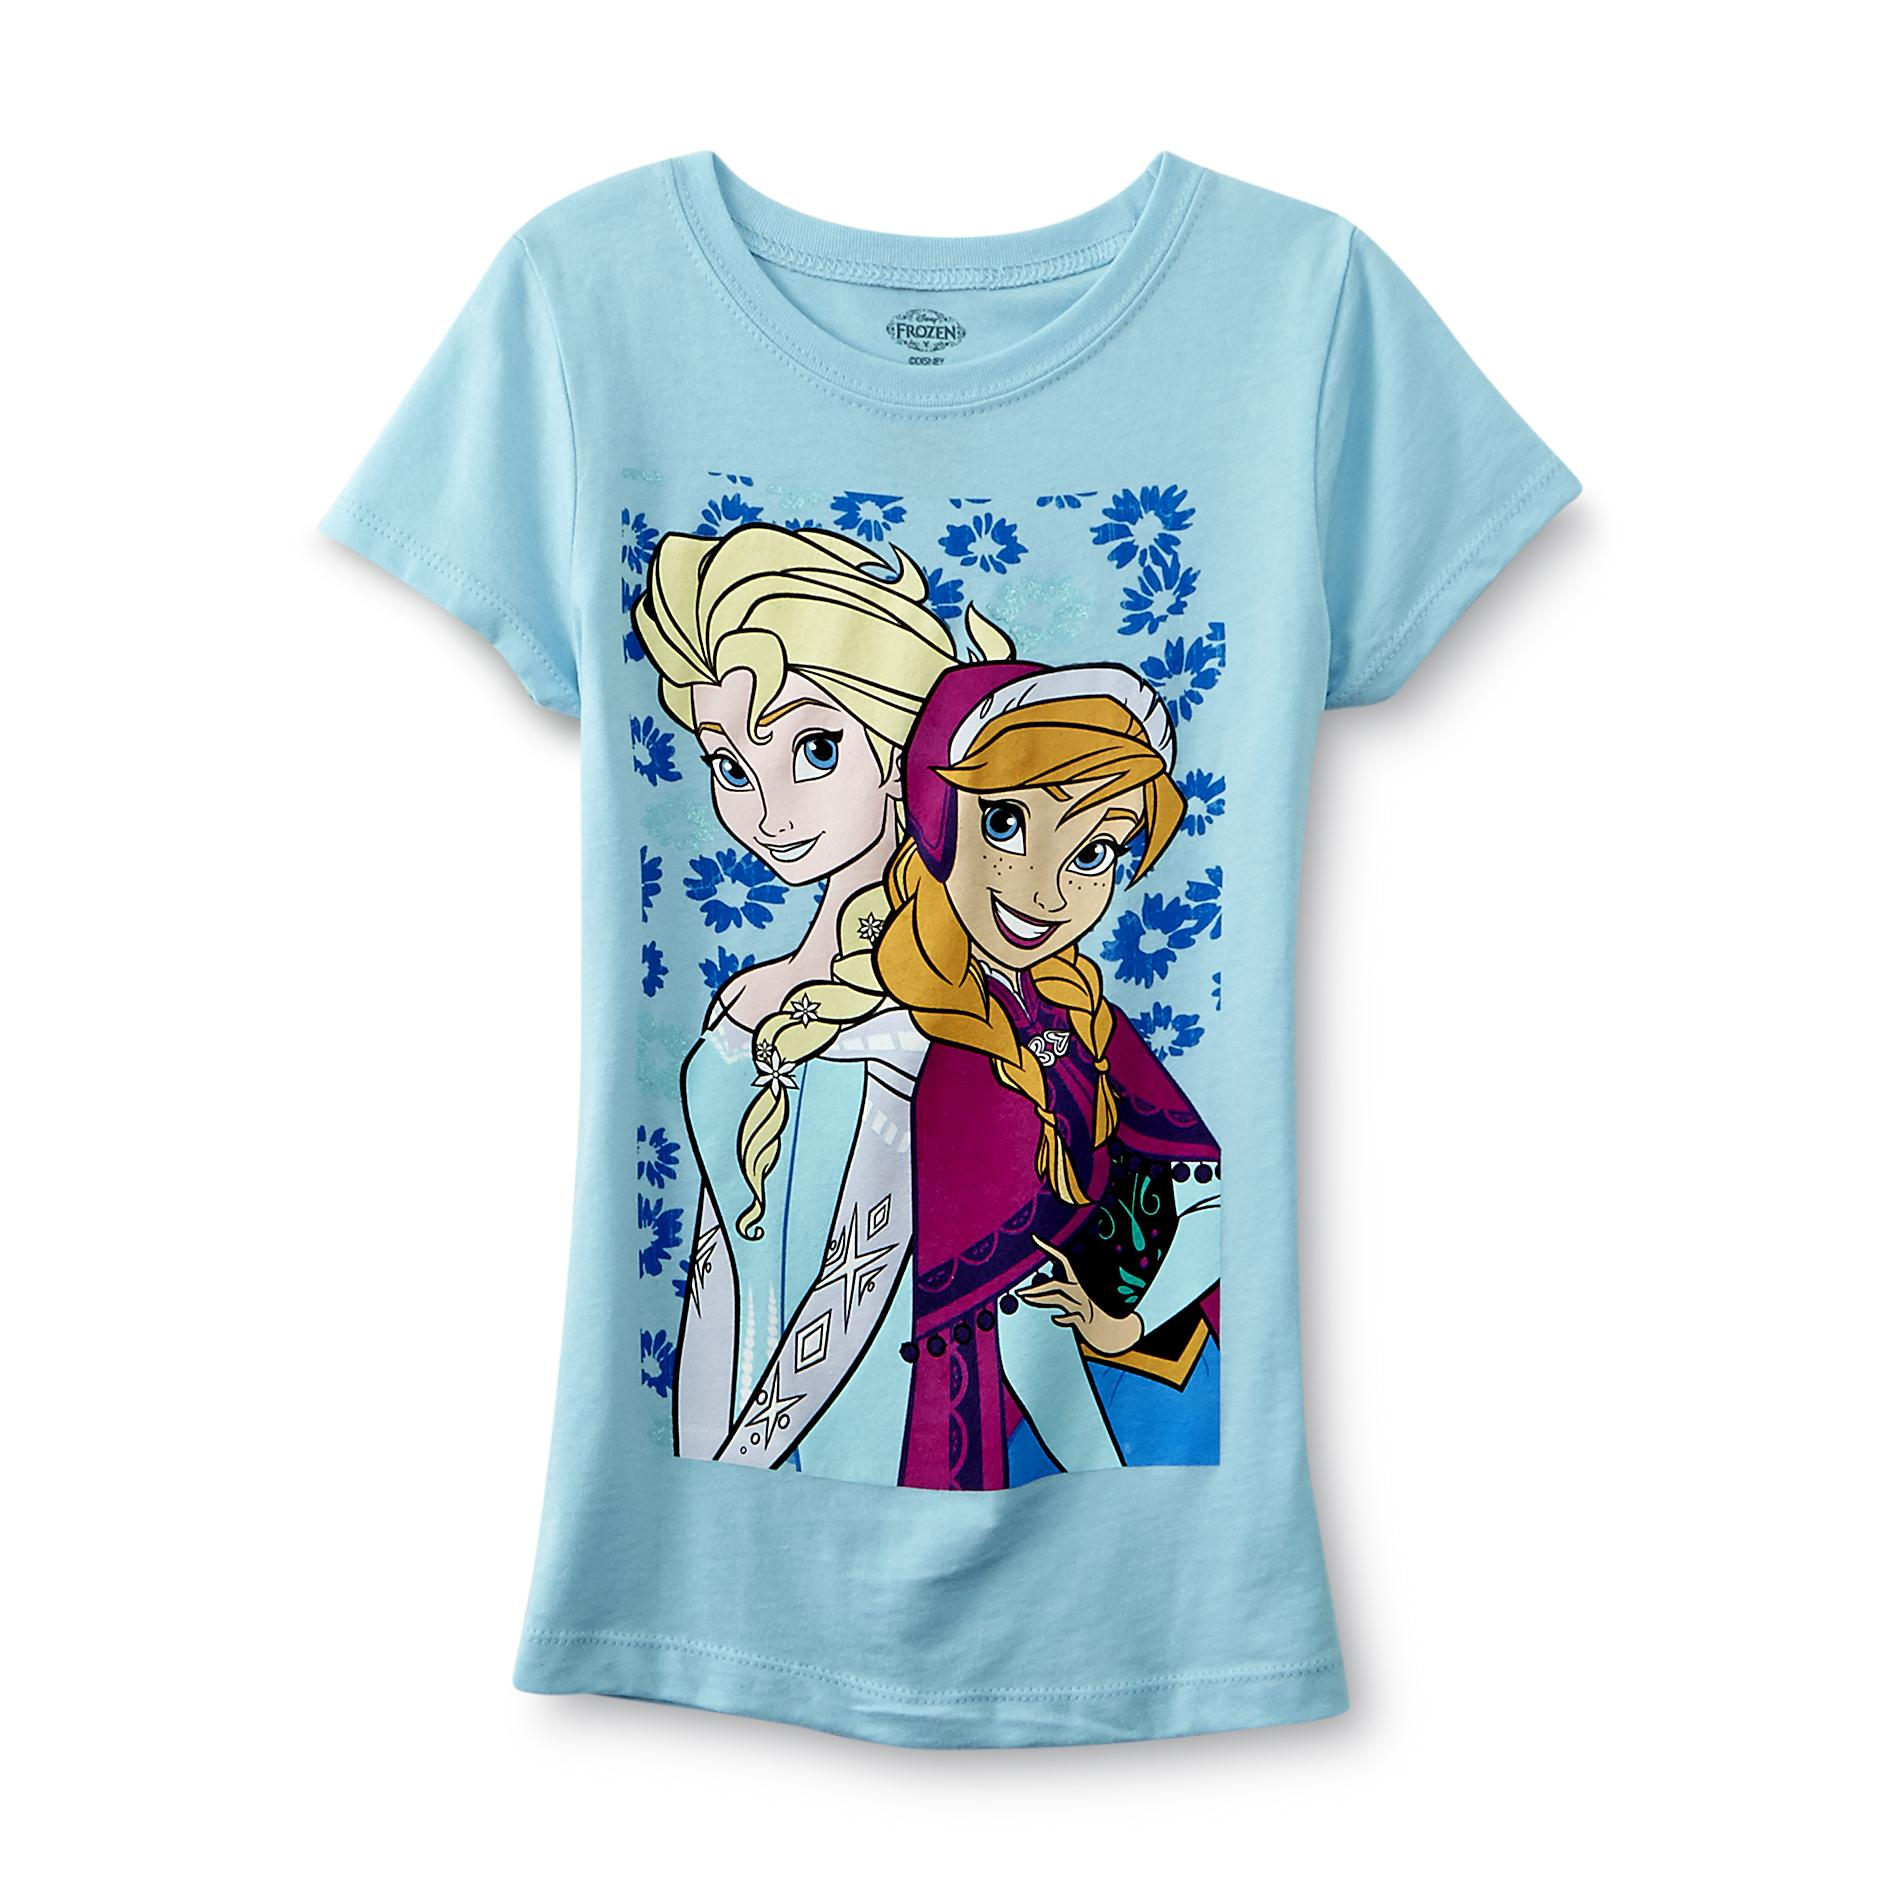 Disney Frozen Girls Graphic T Shirt Elsa Amp Anna